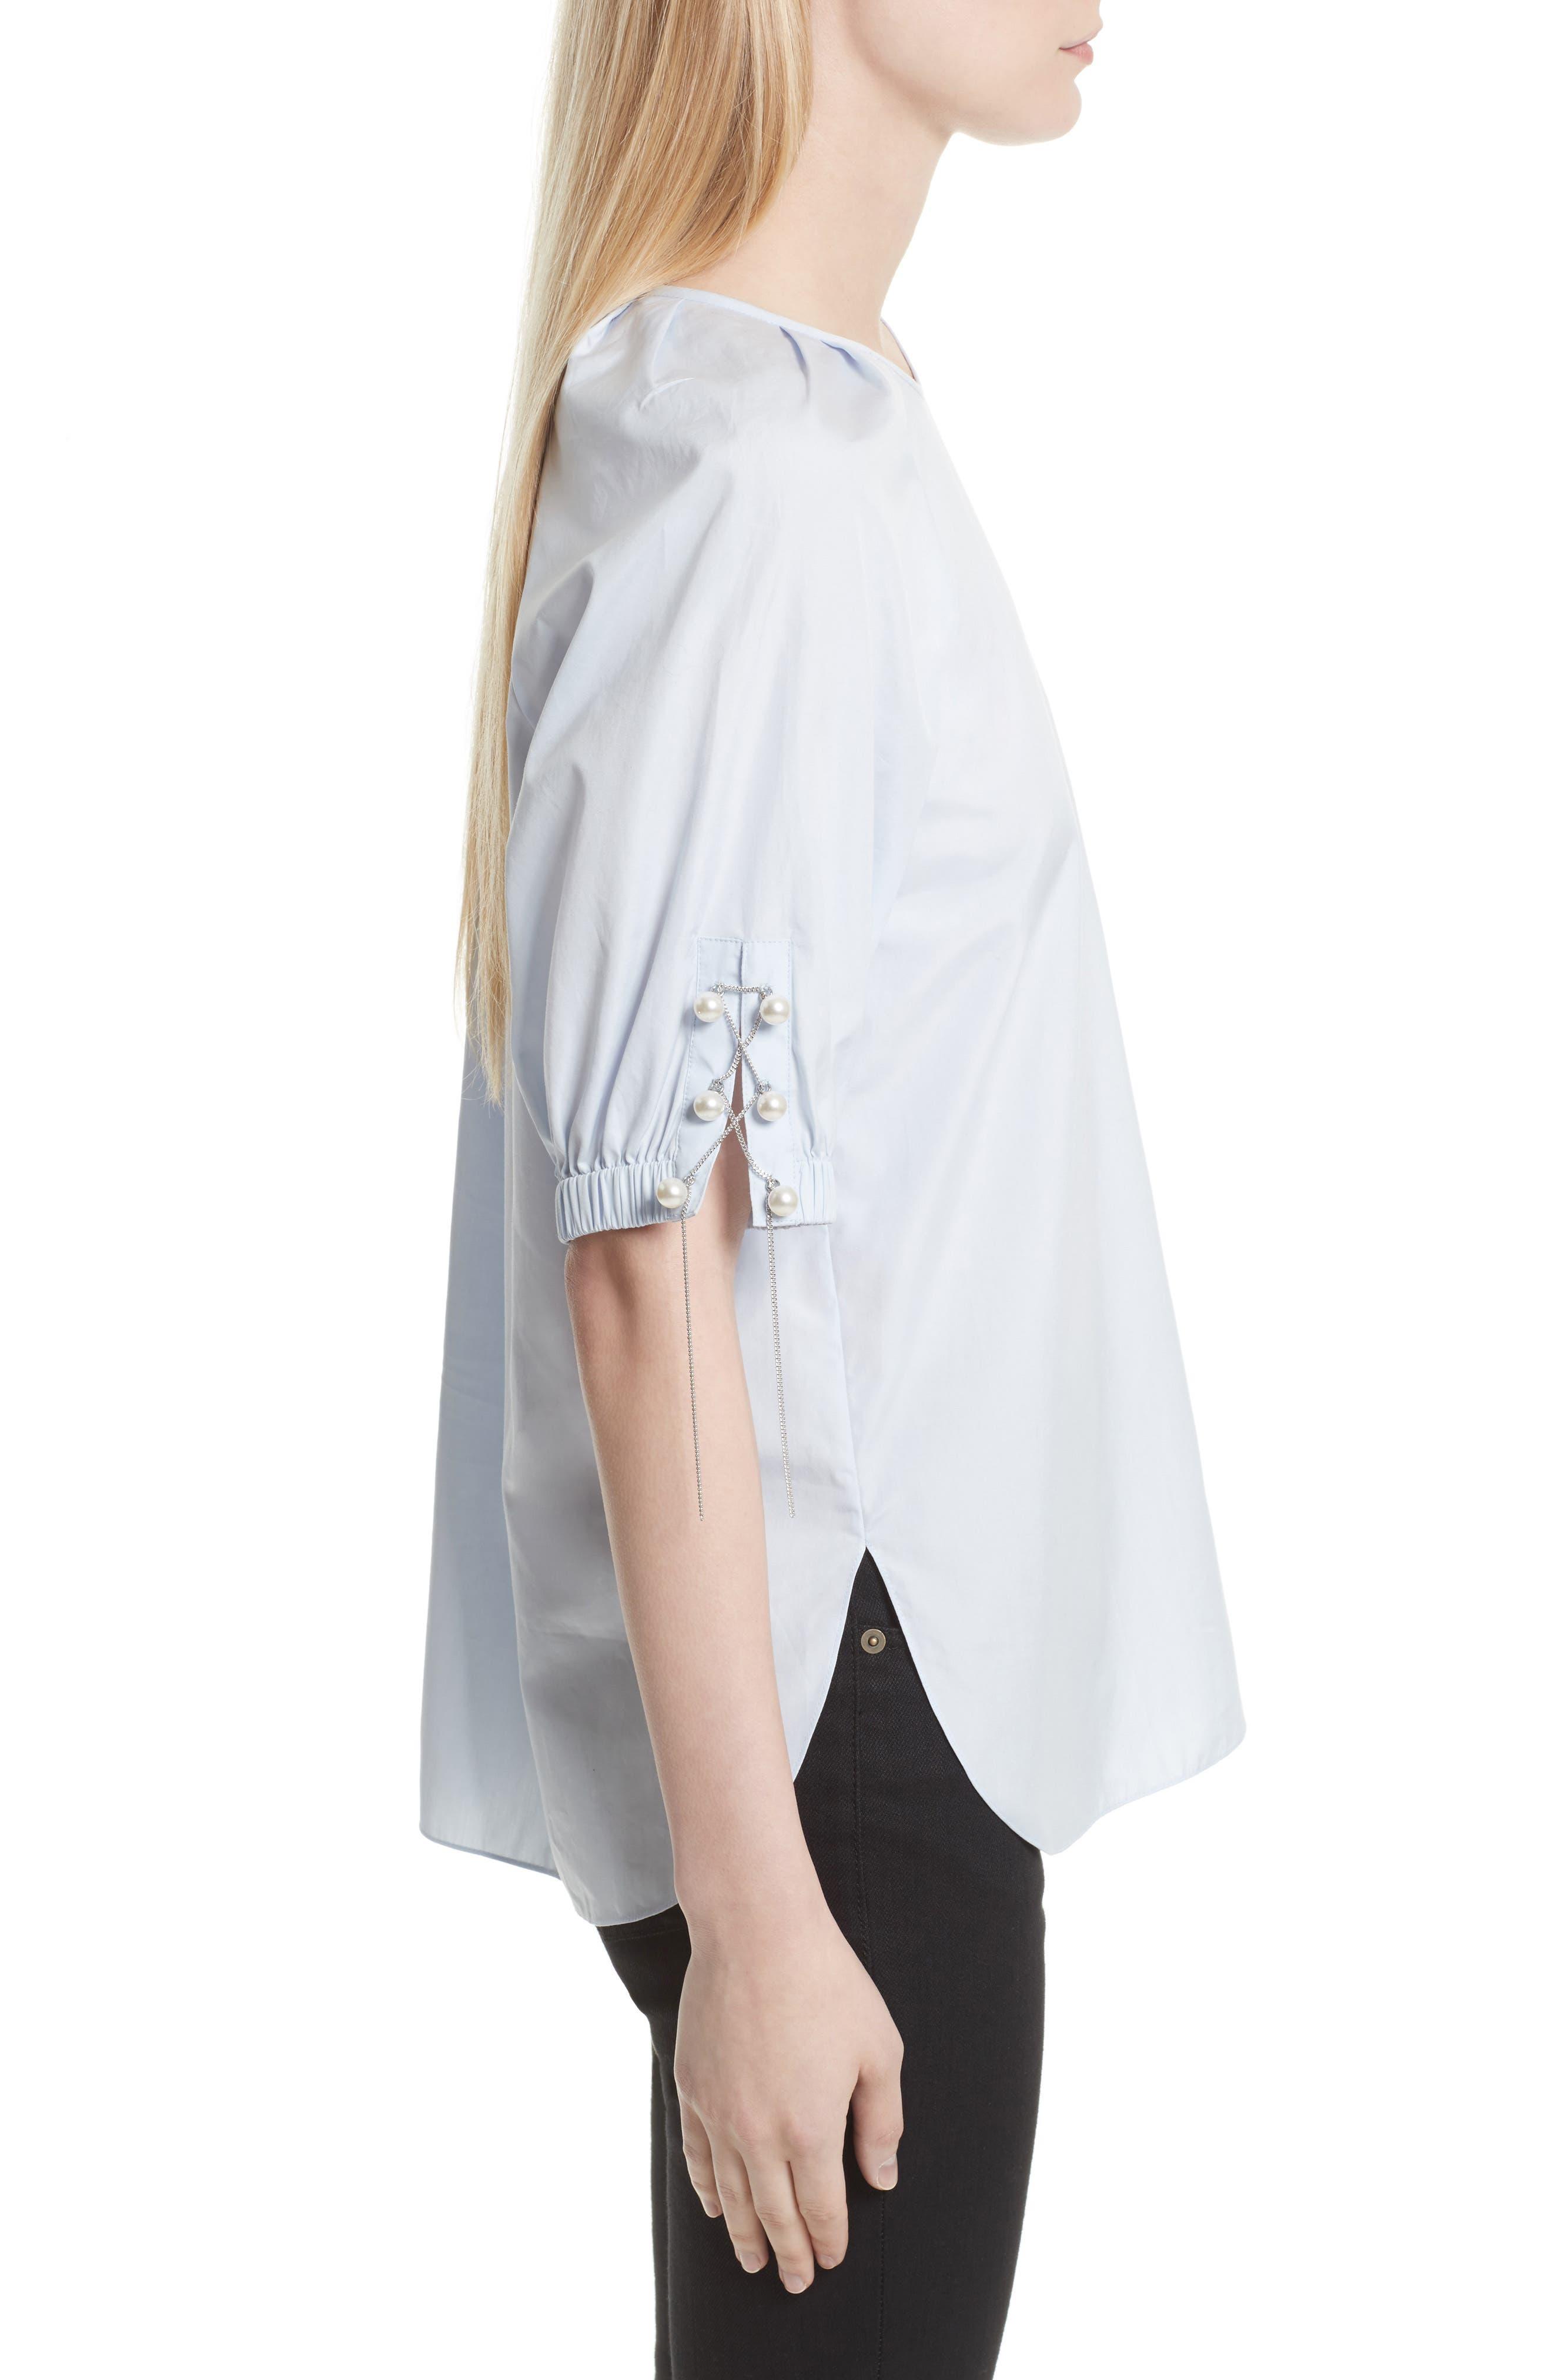 Alternate Image 3  - 3.1 Phillip Lim Faux Pearl & Chain Lacing Cotton Top